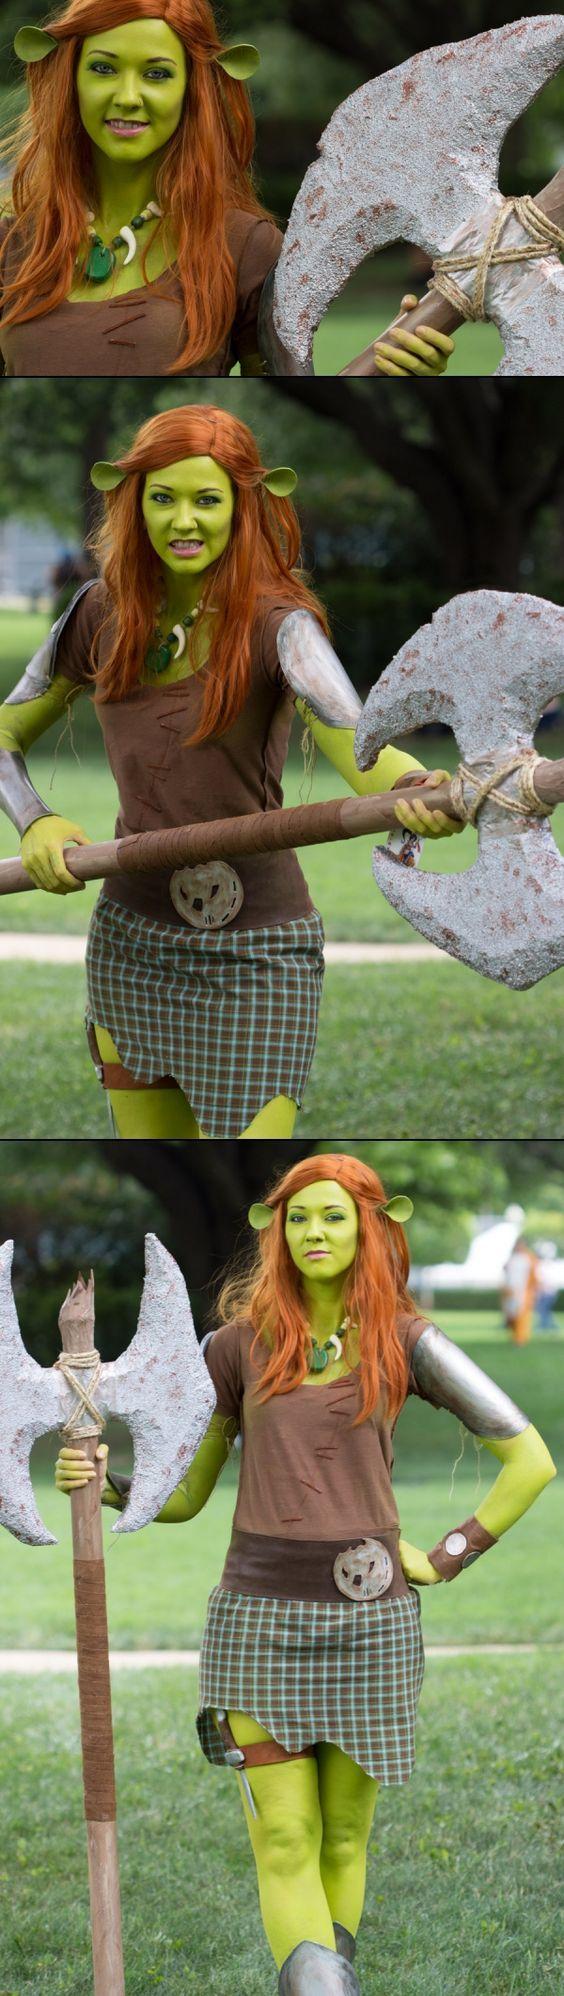 DIY Shrek Princess Fiona Halloween Costume Idea